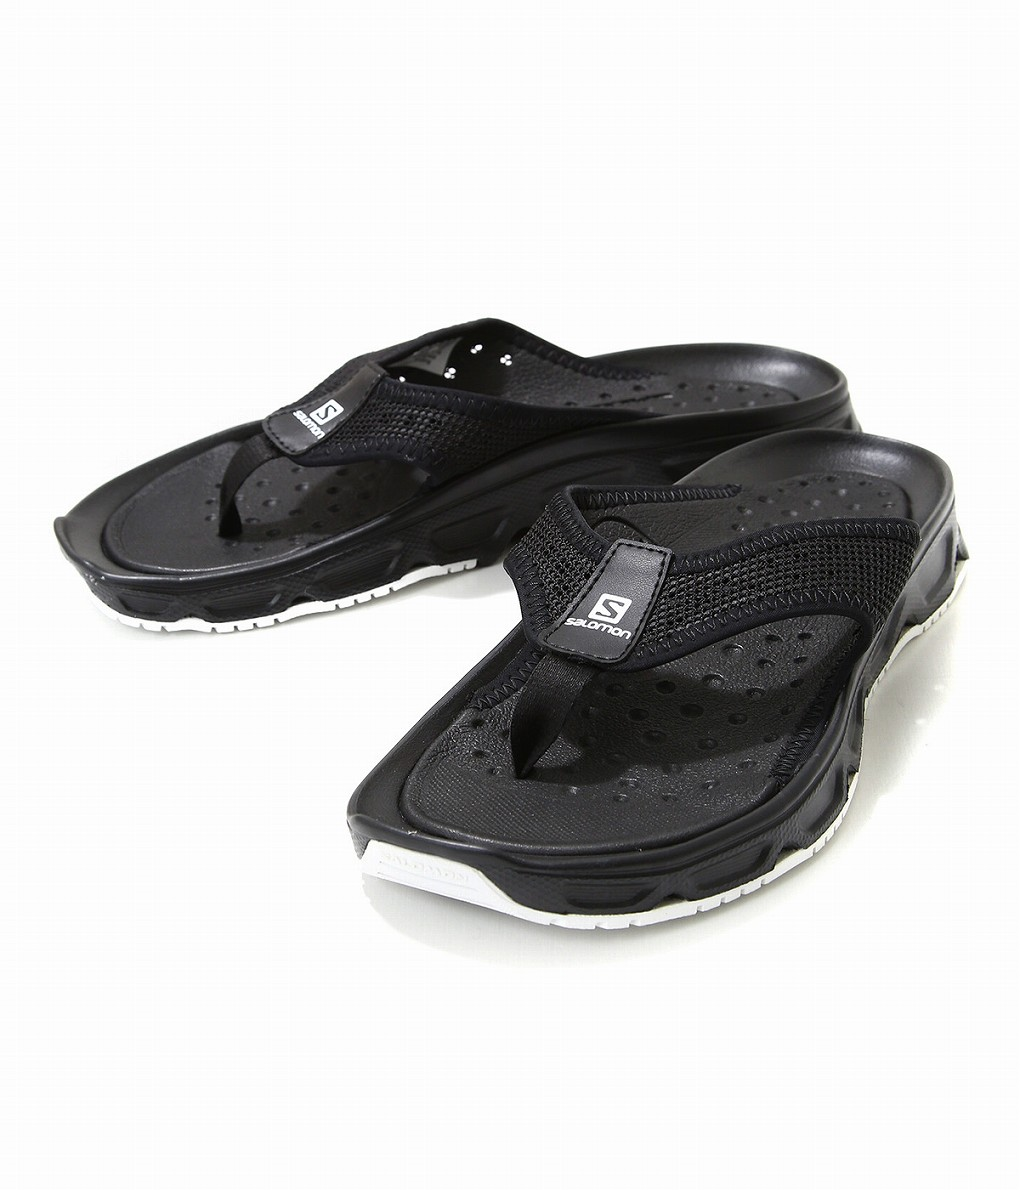 440248b25497 SALOMON   Salomon  RX BREAK 4.0 BLACK BLACK WHITE  Salomon RX break 4.0  black sandals shoes  L40744500